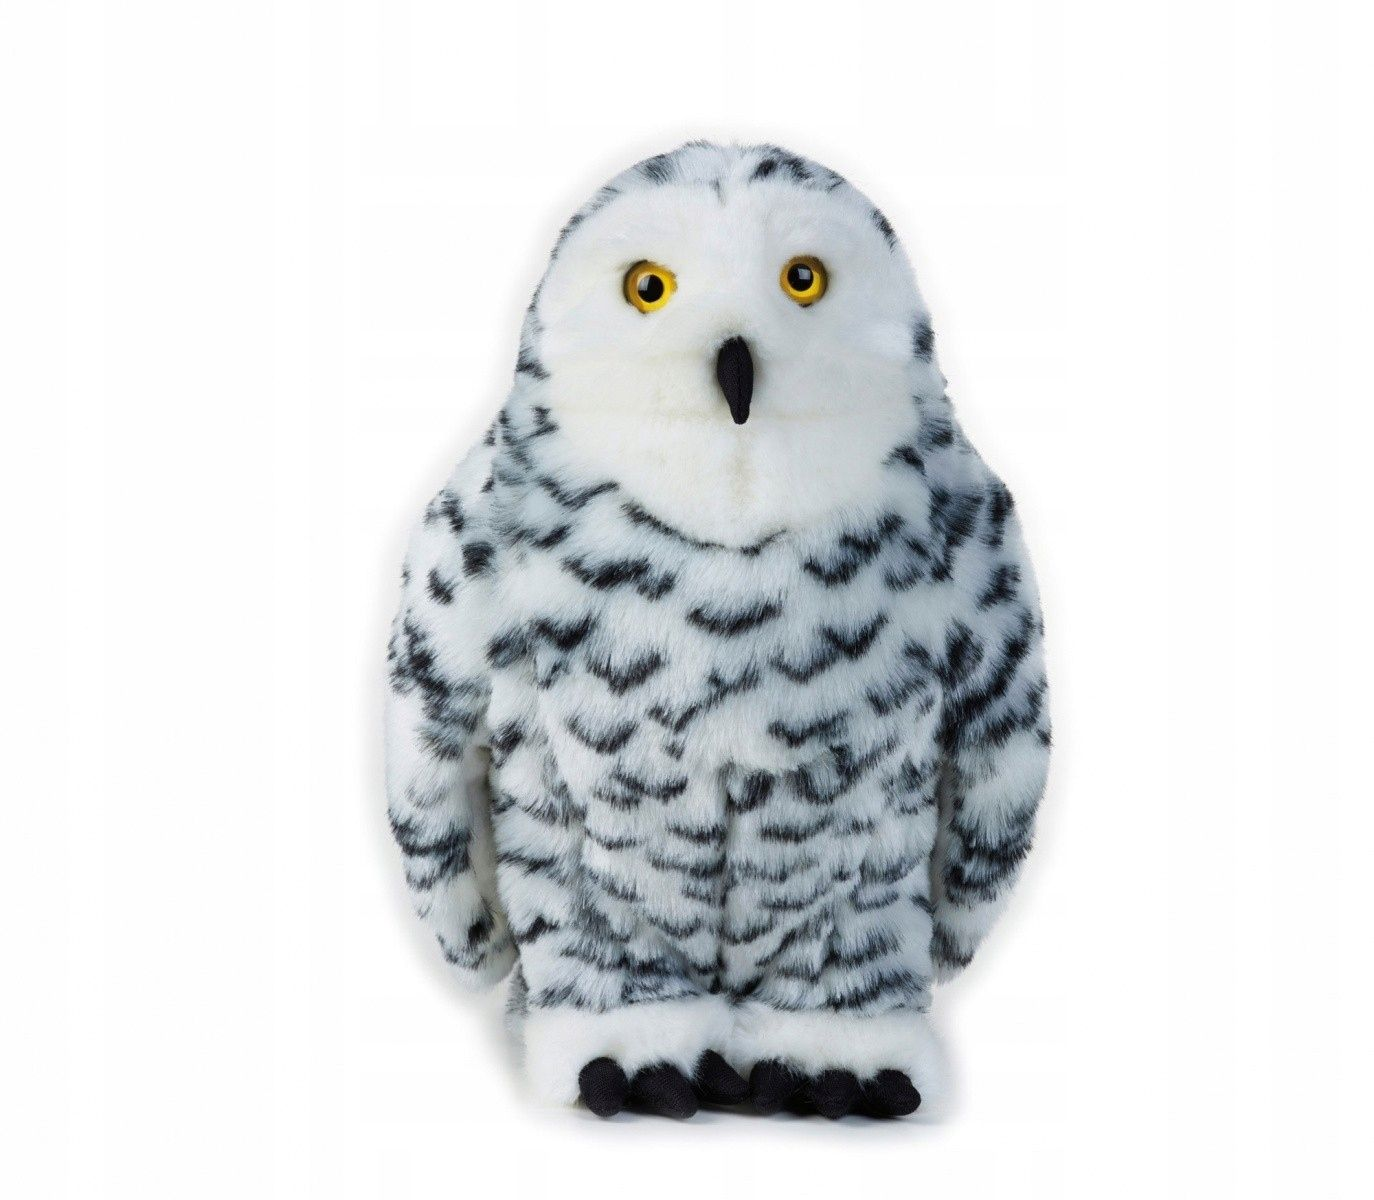 Dante Pluszak National Geographic Sowa Sniezna 27 7481229112 Oficjalne Archiwum Allegro Snow Owl Owl Plush Plush Stuffed Animals